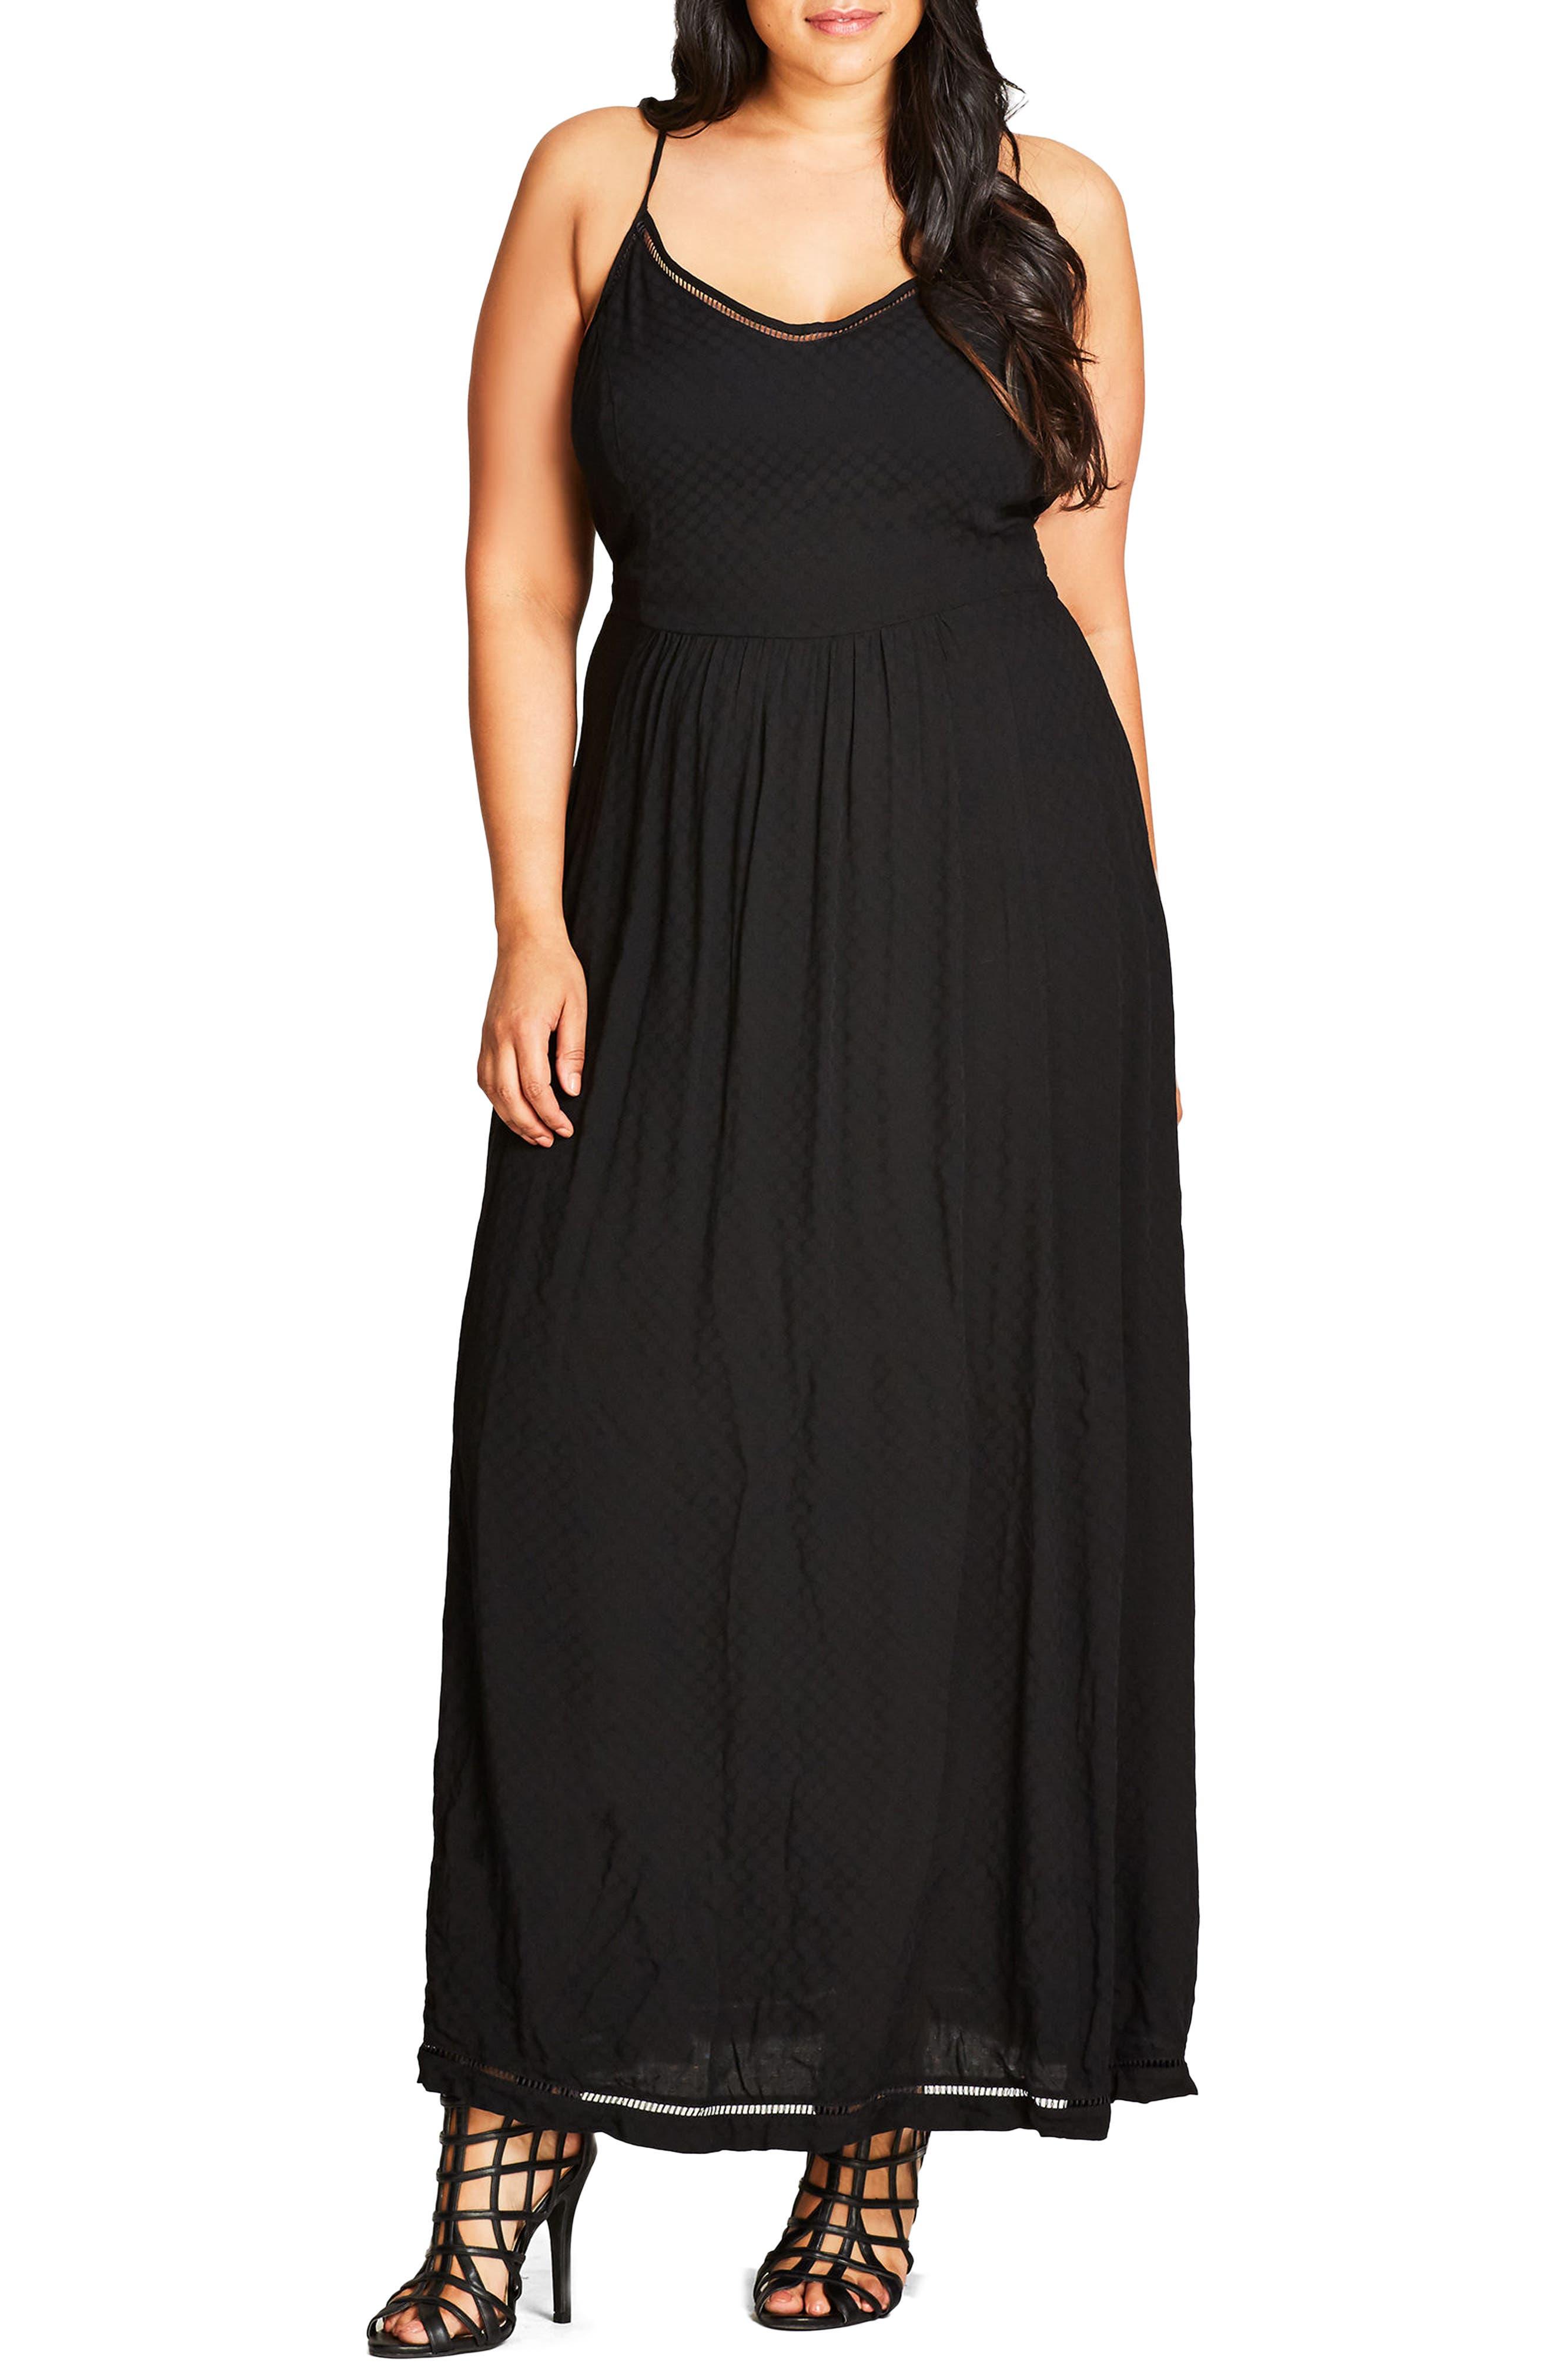 Picnic Party Maxi Dress,                         Main,                         color, 001